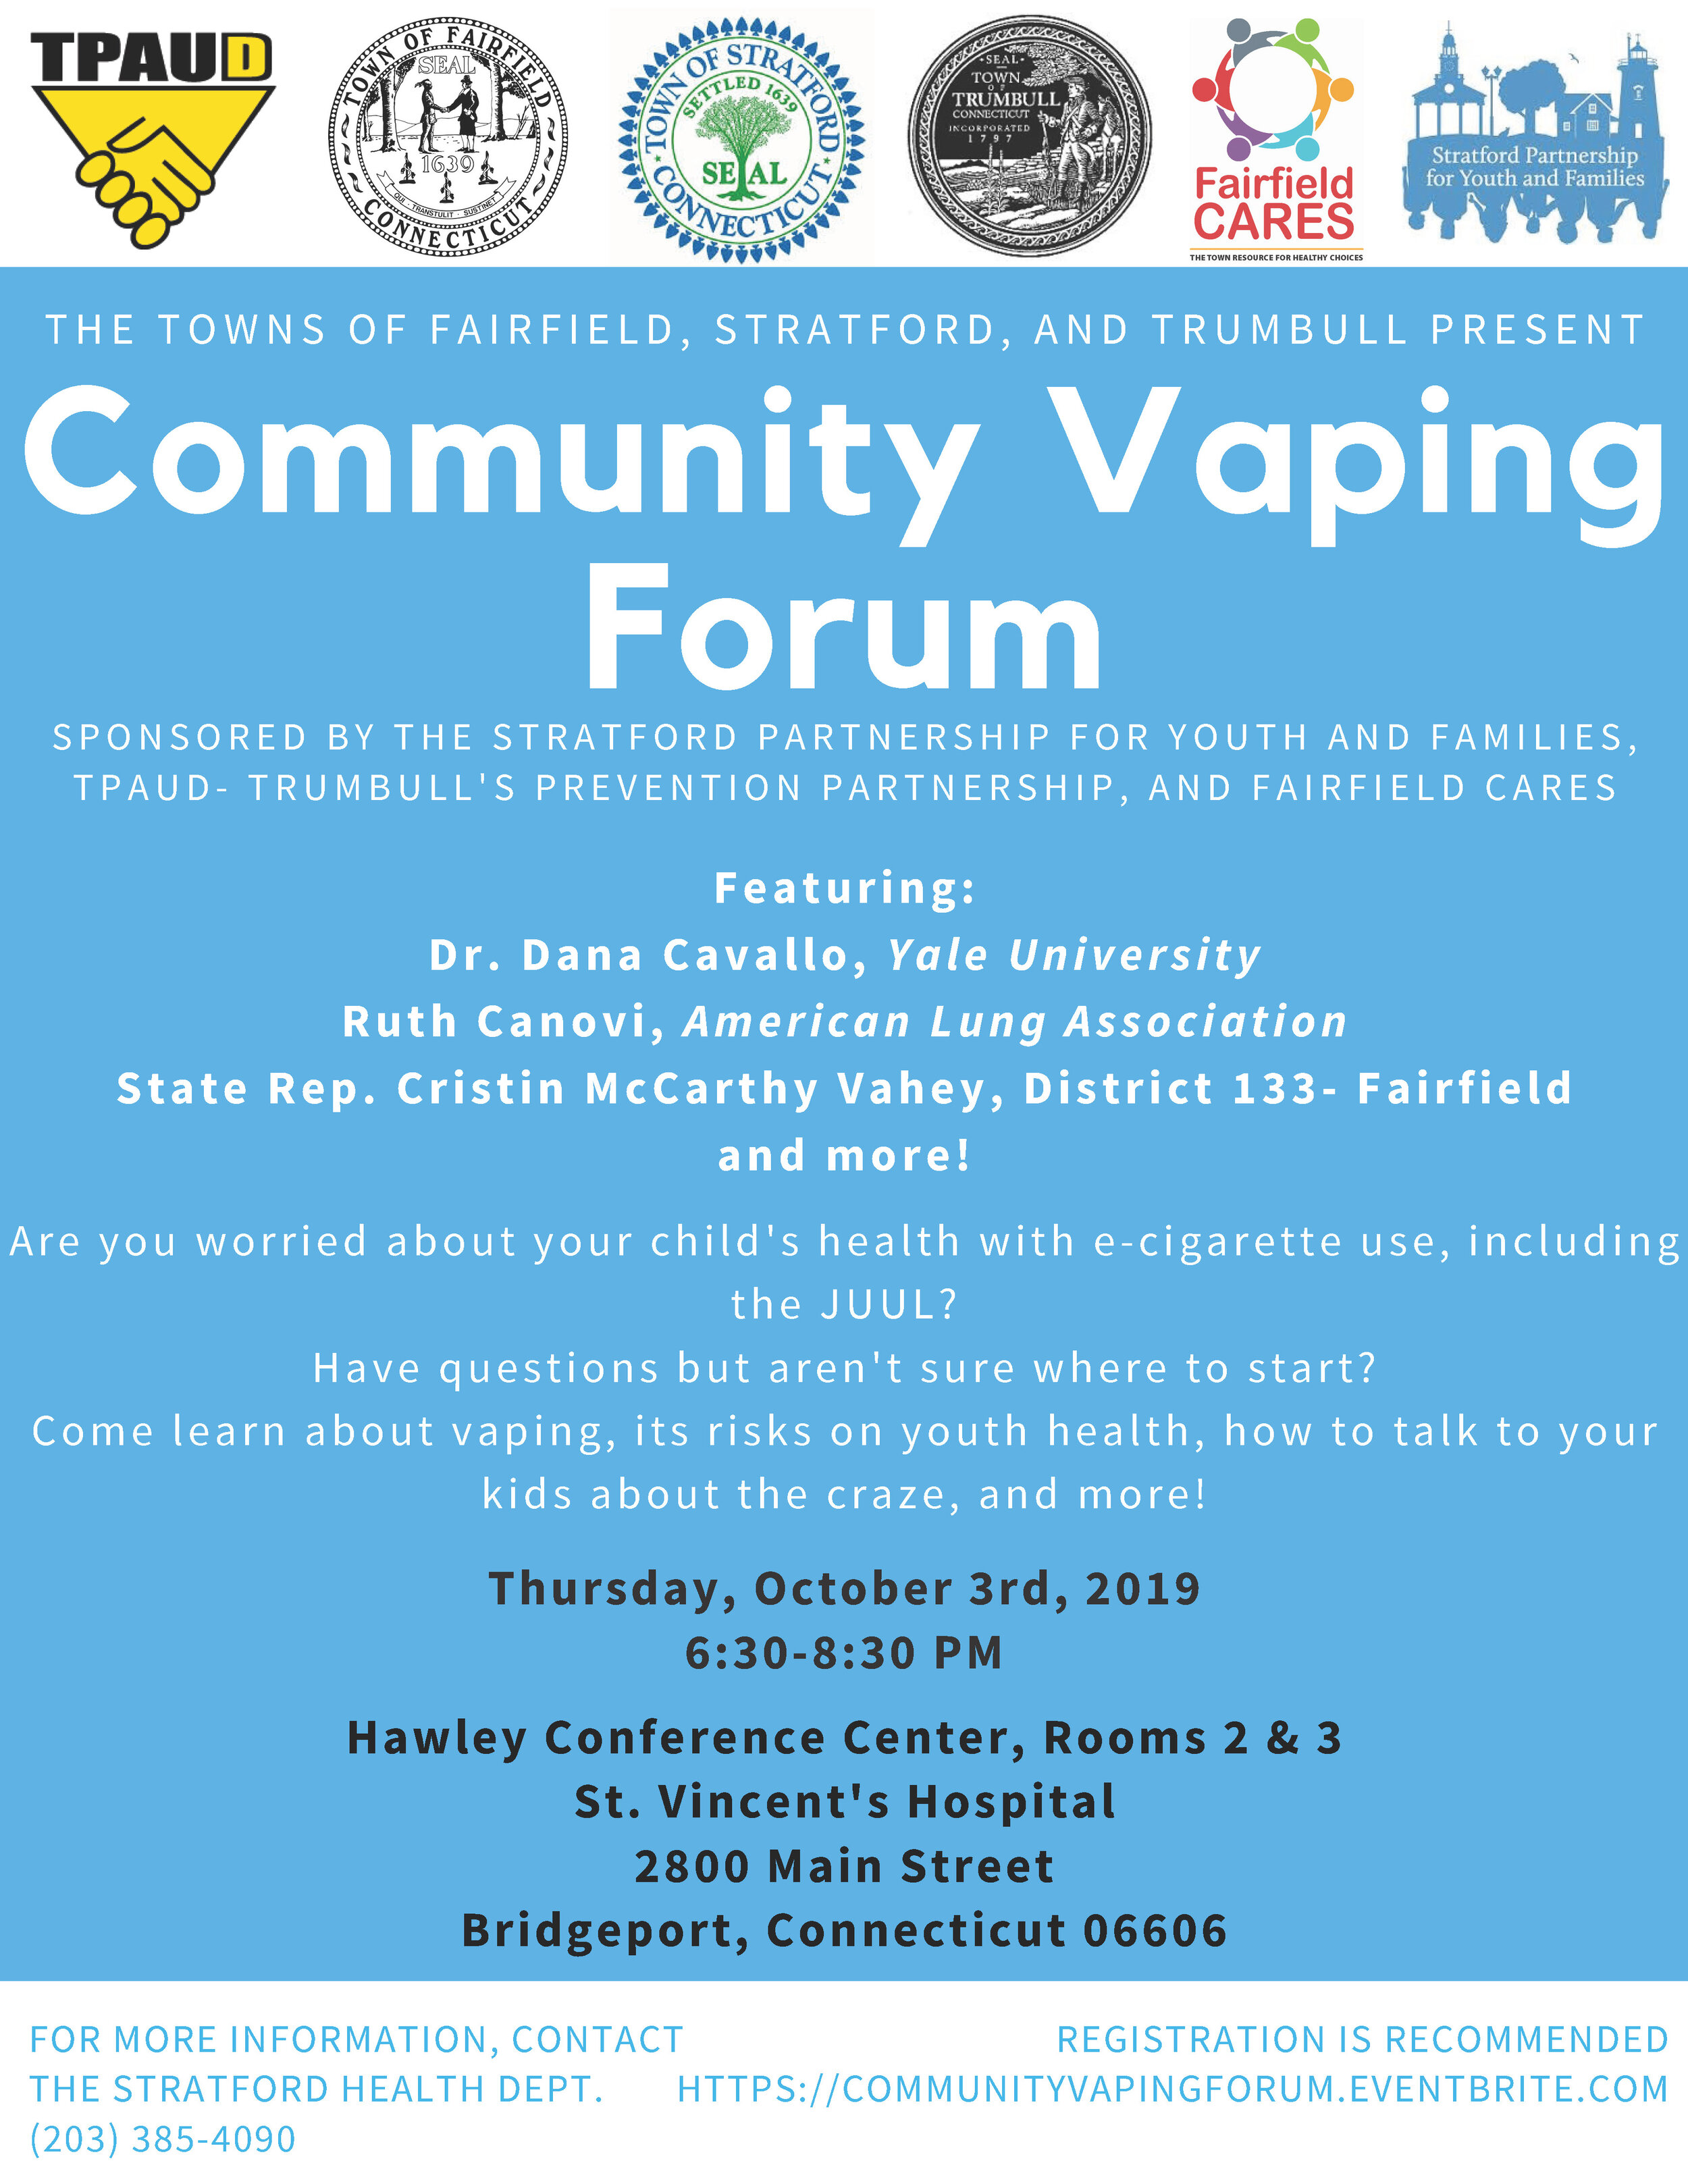 10-03-2019 Community Vaping Forum Flyer FINAL (2).jpg